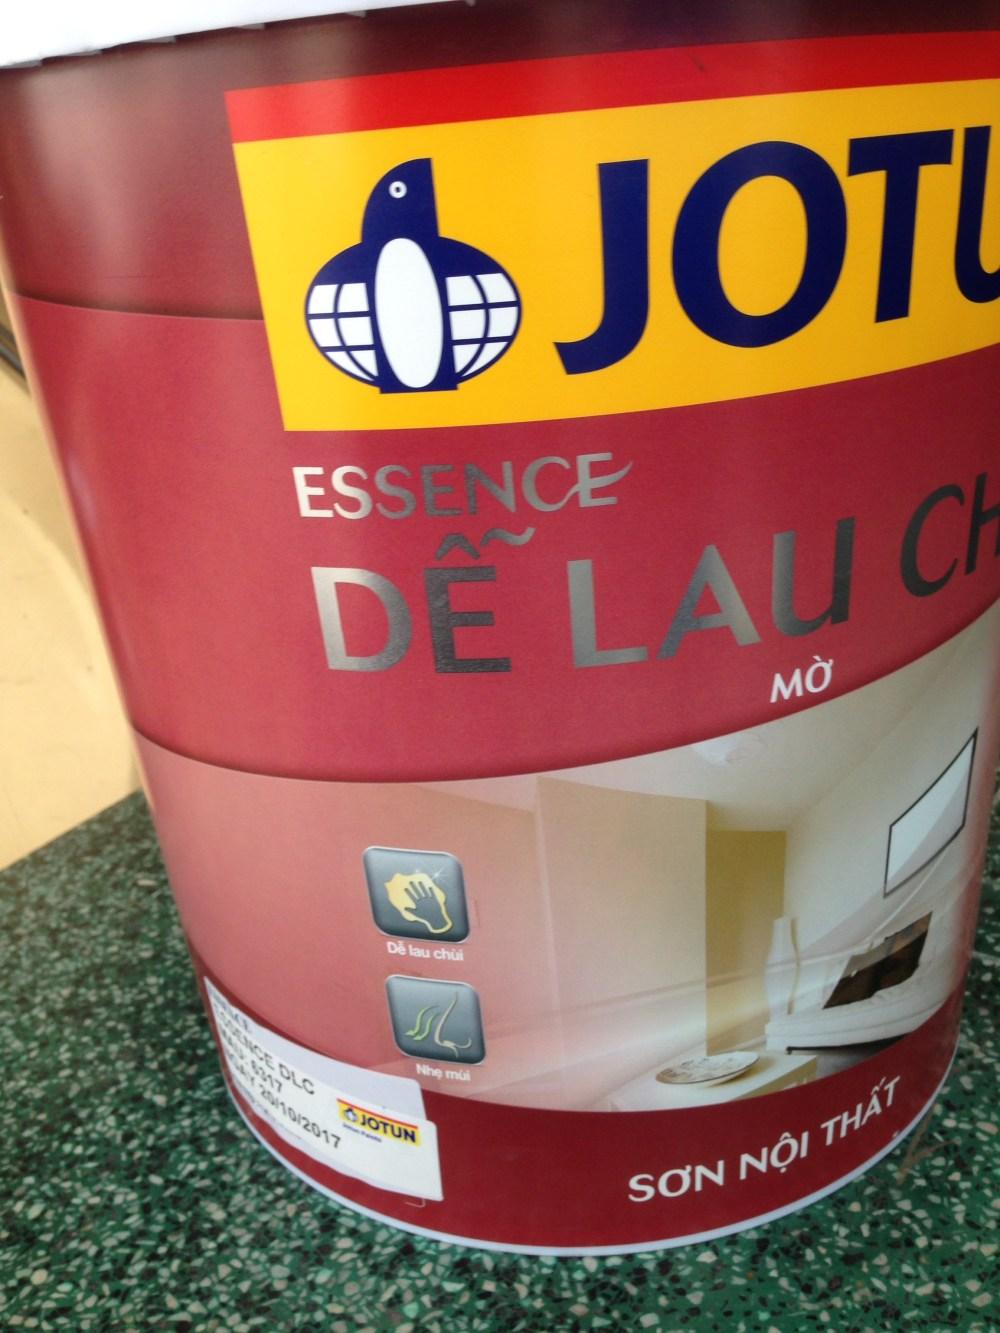 Sơn Jotun Essence dễ lau chùi